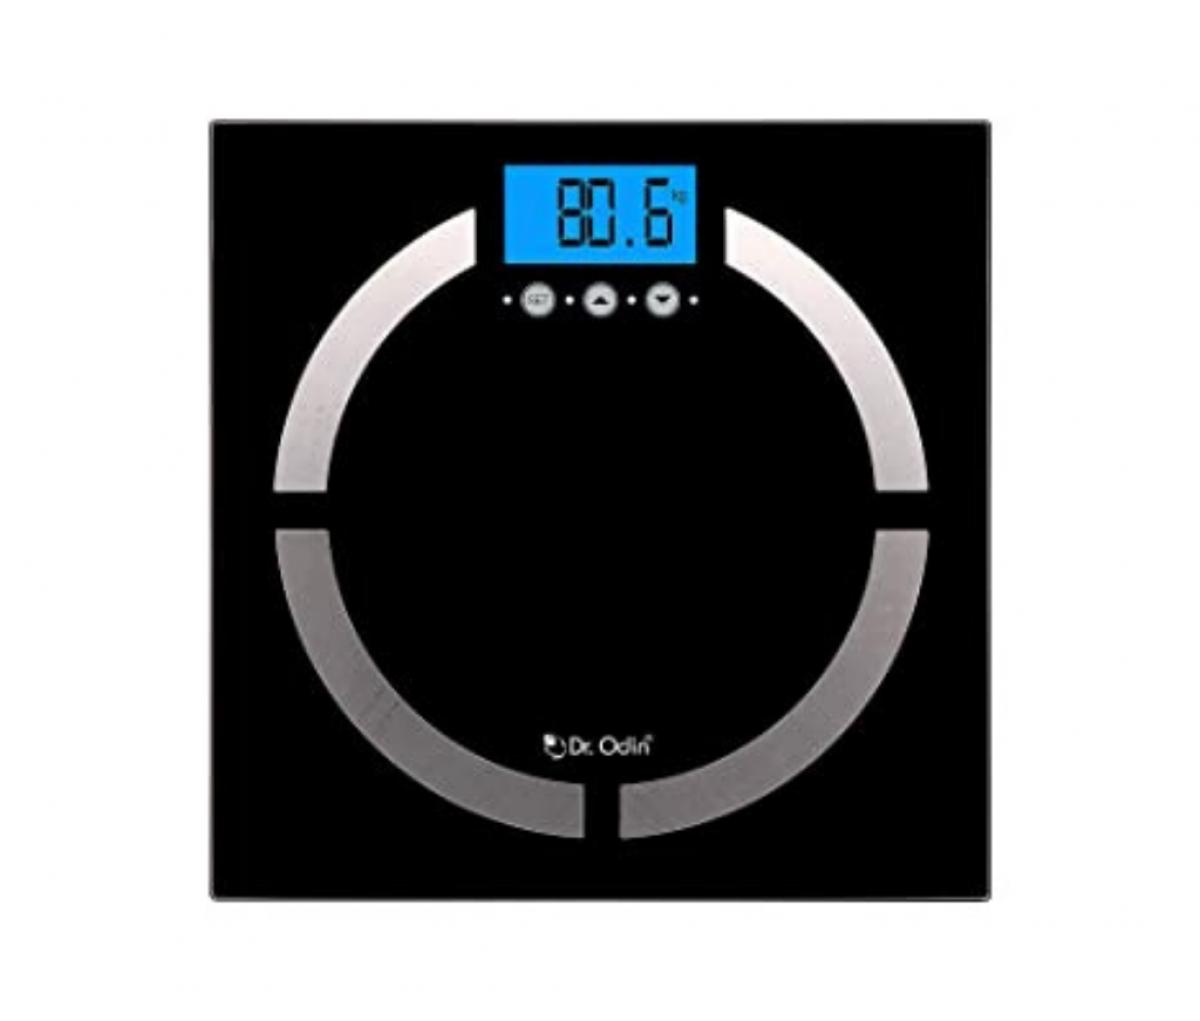 Dr.Odin Body Fat Analyzer With Latest BIA Technology,Sport Mode,Body Mode, High Precision Strain Gauge Sensor & Auto Off Function (CF-570BT) White